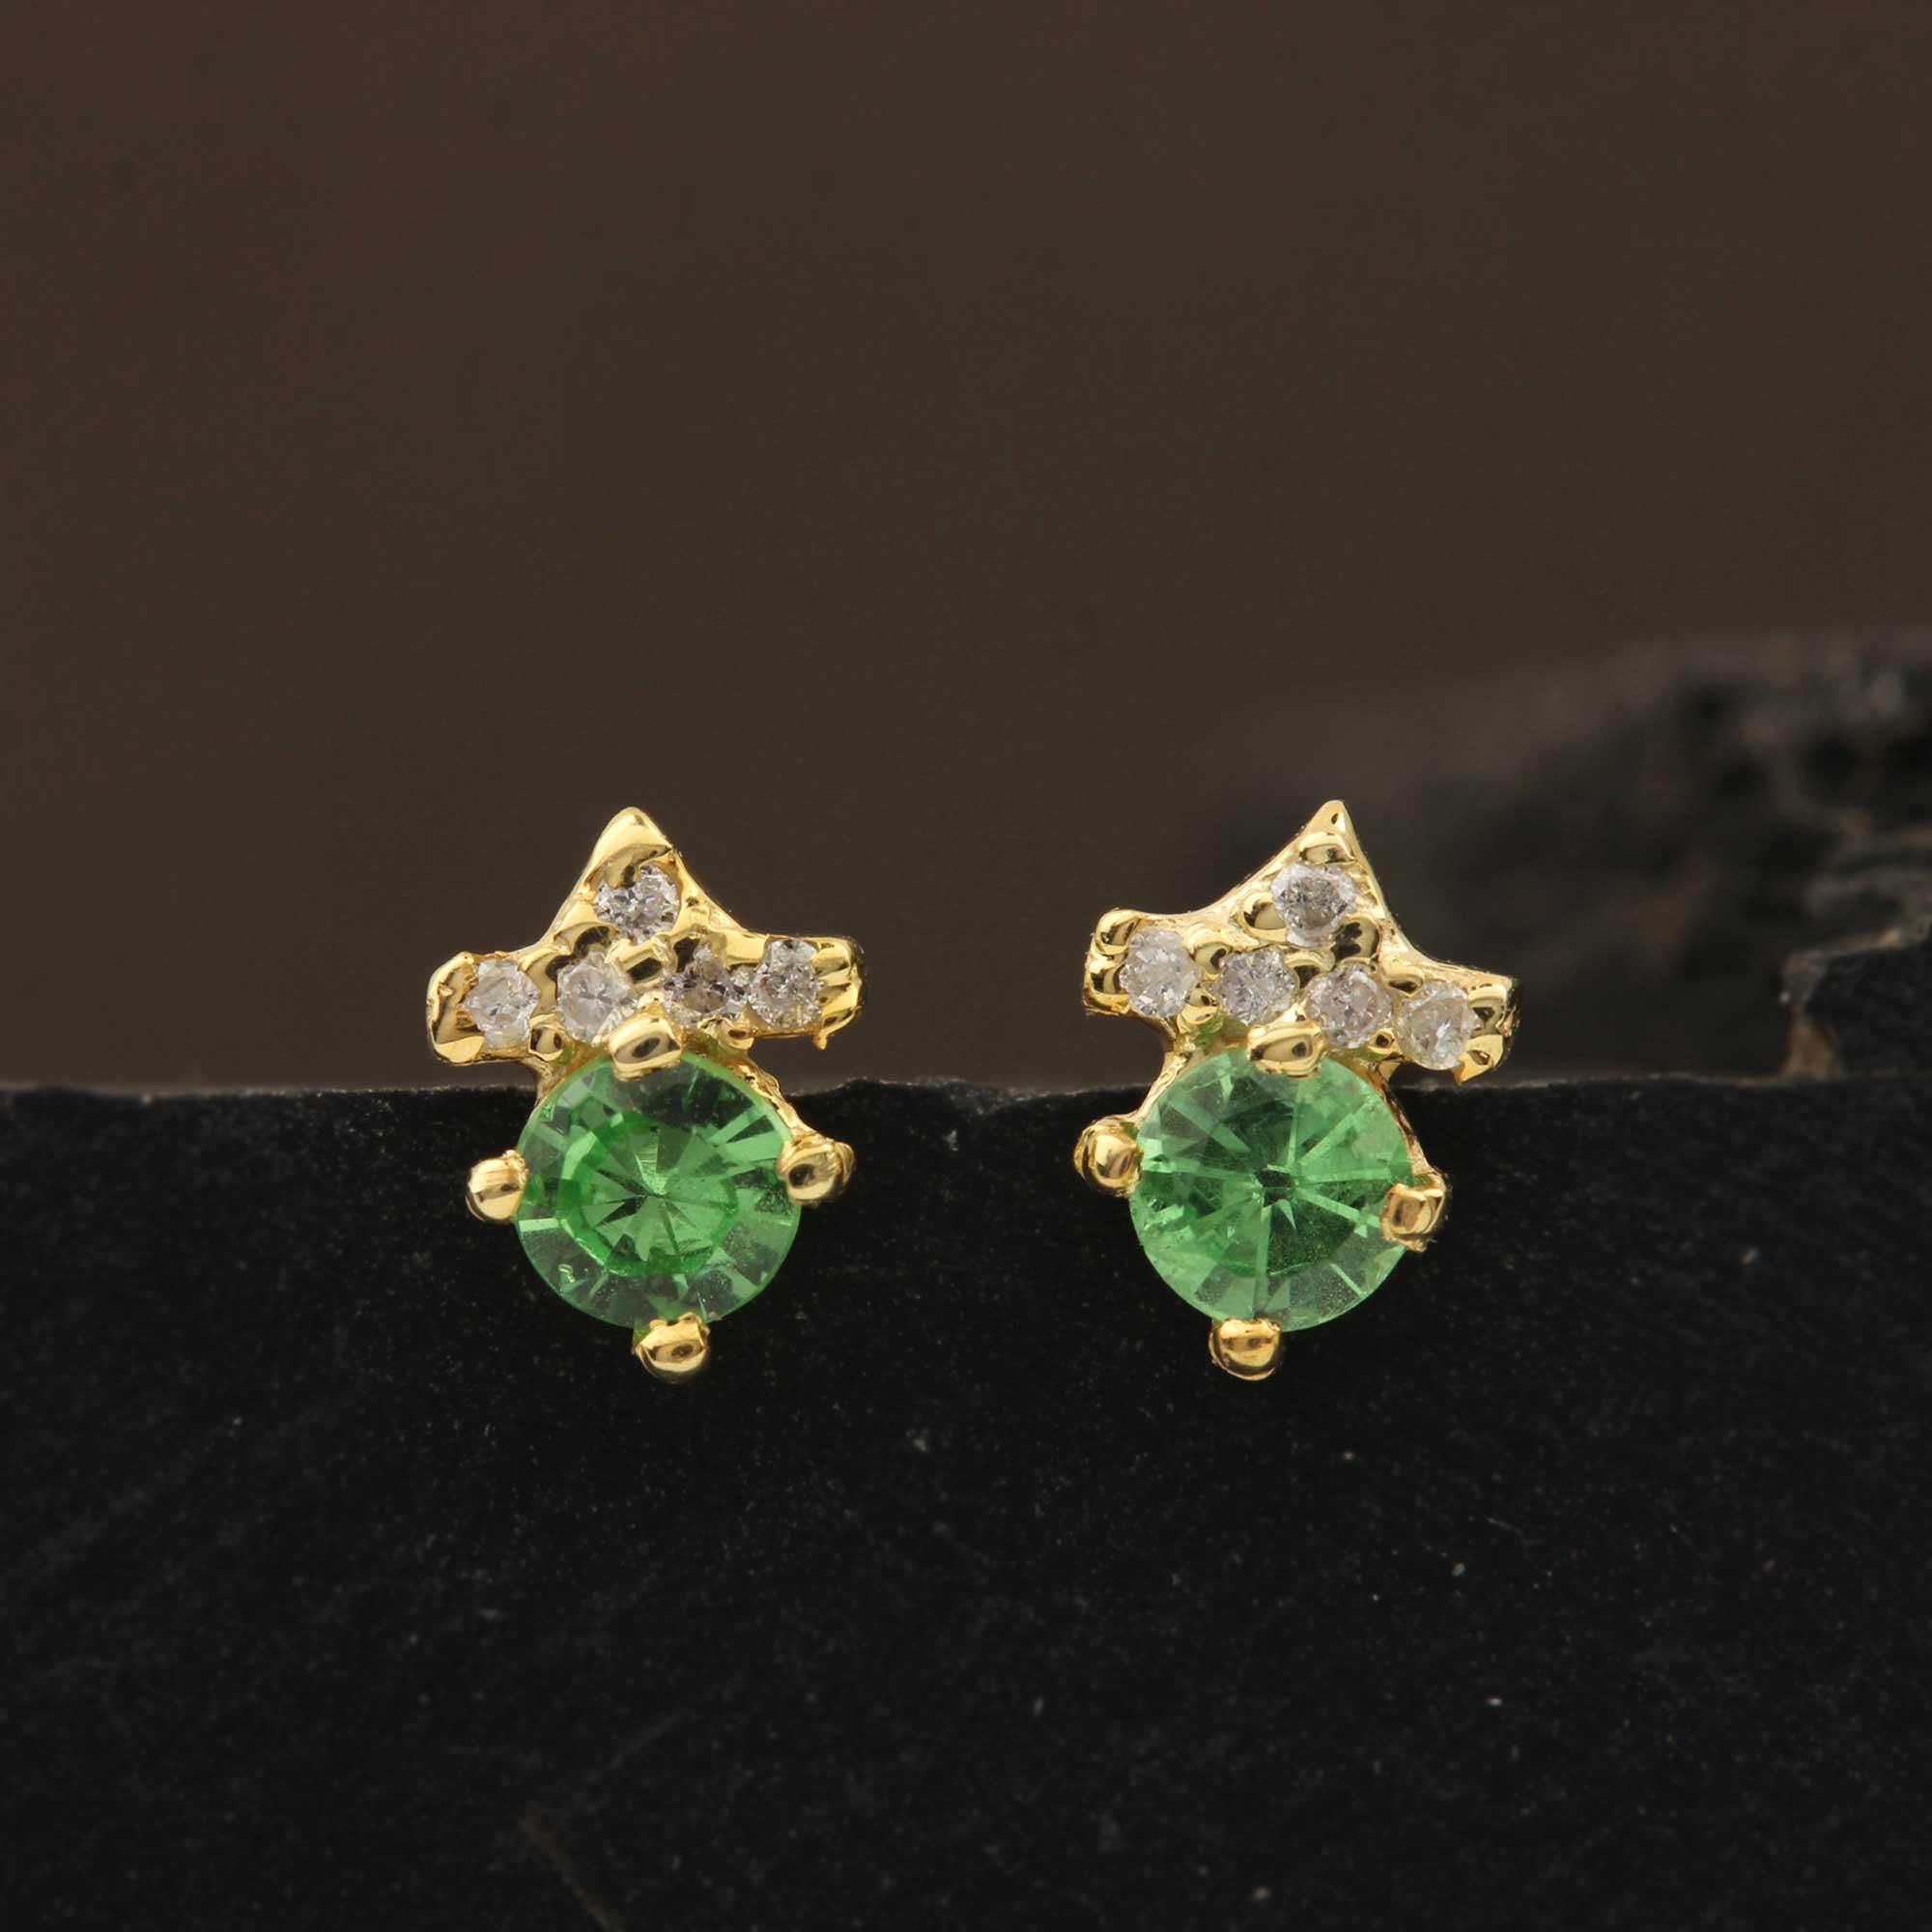 14k Solid Gold Natural Diamond & Tsavorite Solitaire Stud Earrings